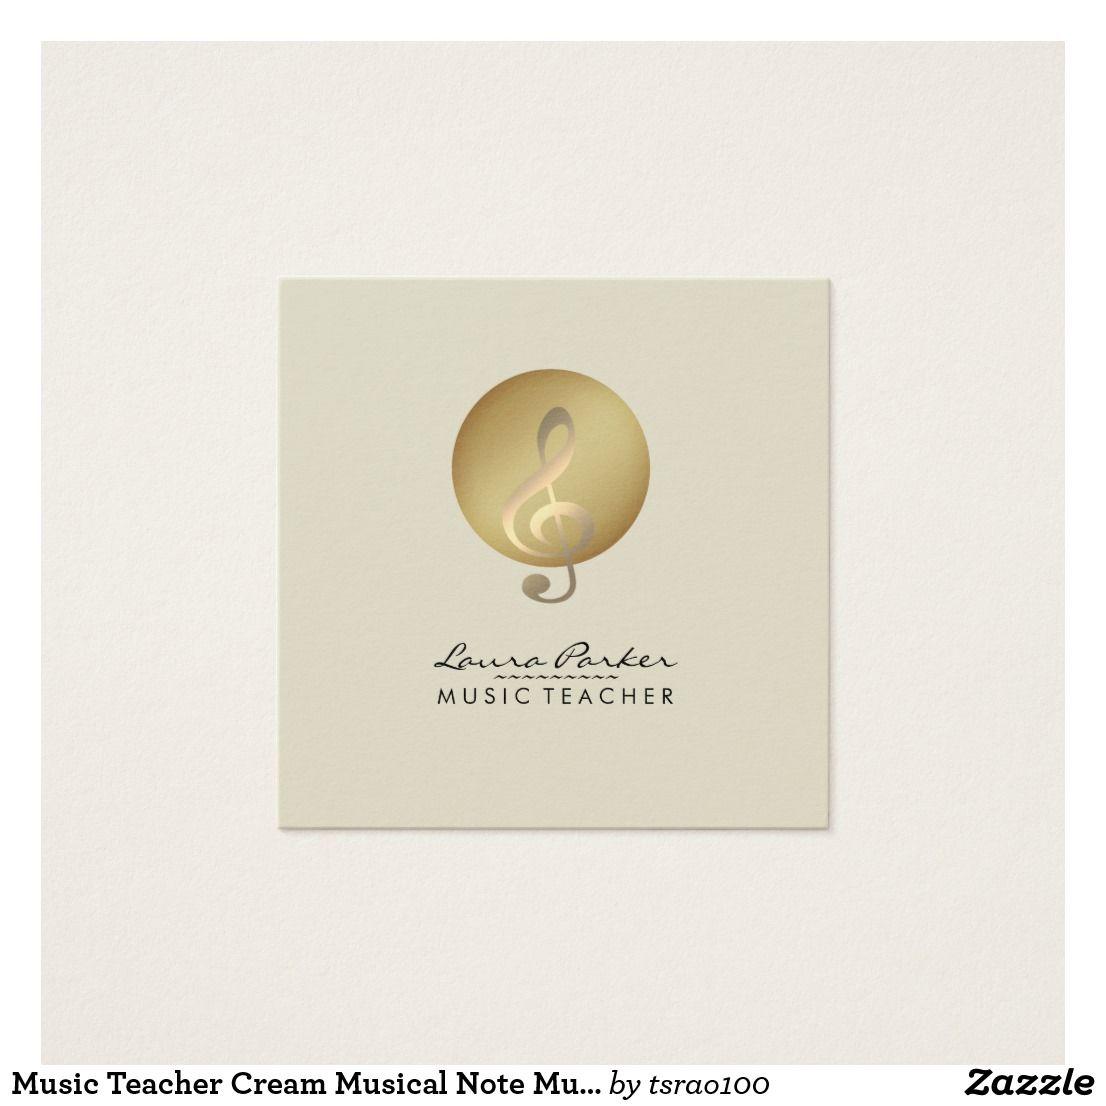 Music Teacher Cream Musical Note Musician Square Business Card ...